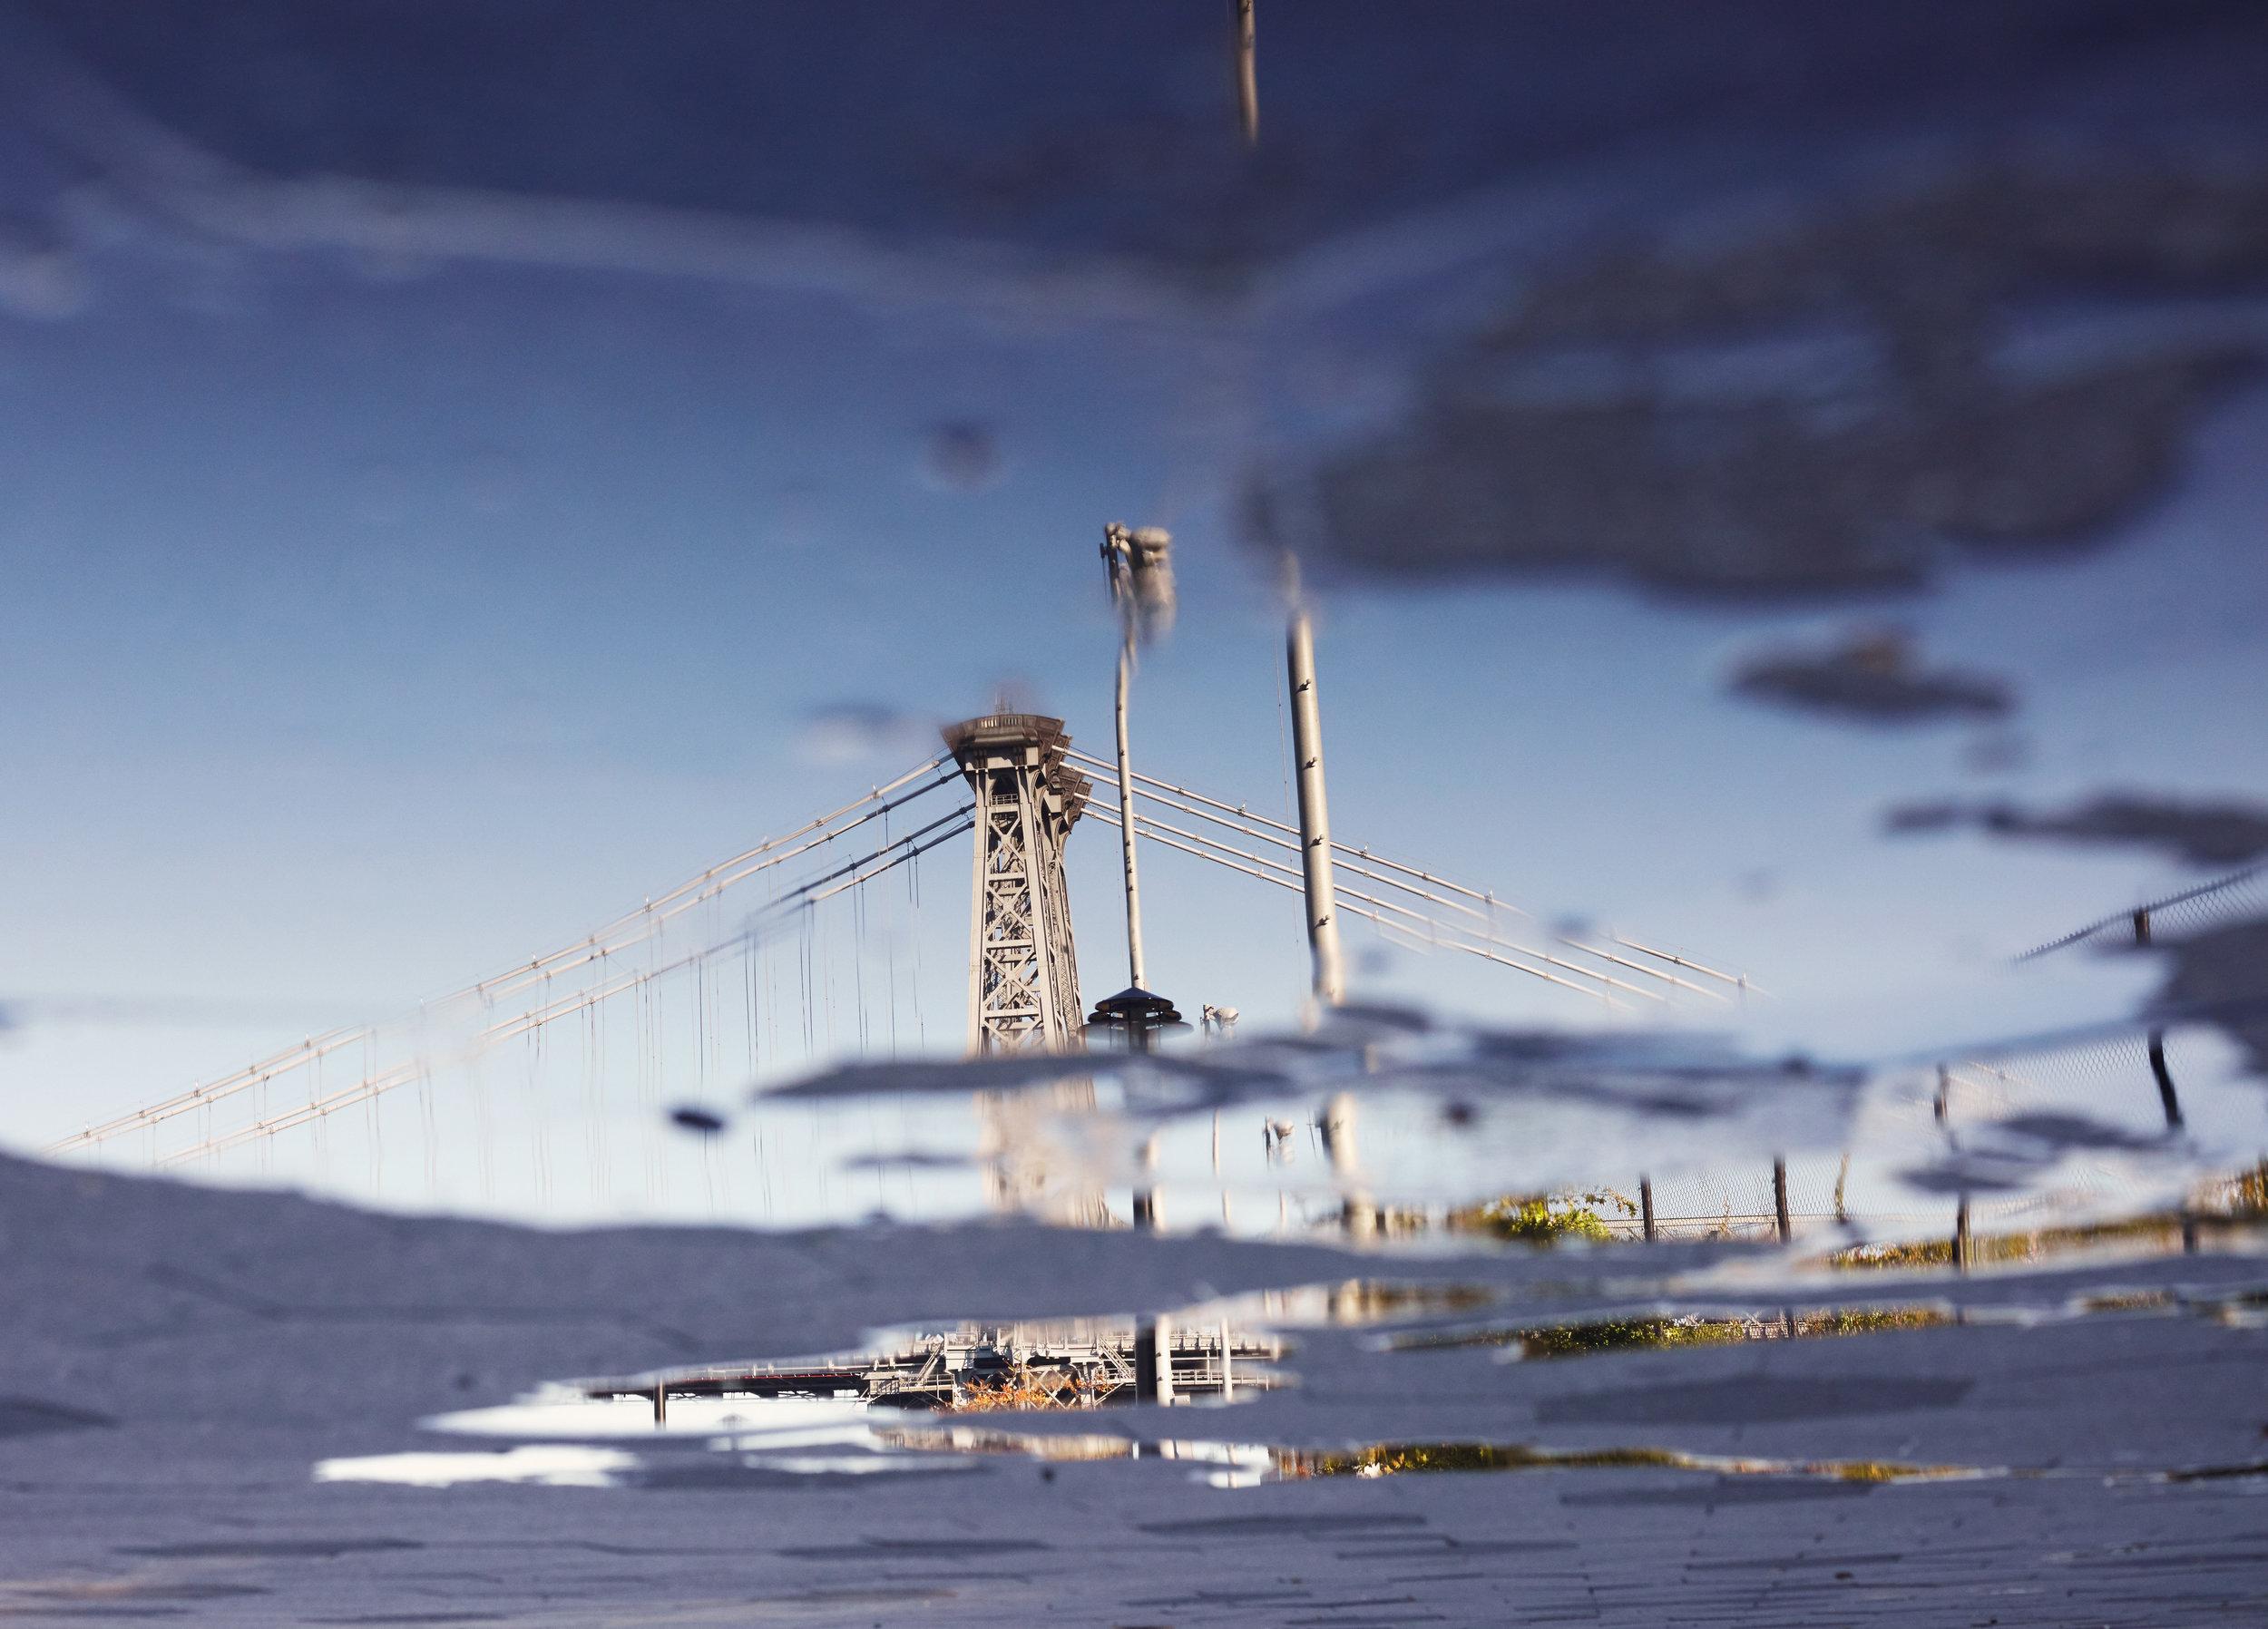 Williamsburg Bridge, Reflection in Puddle